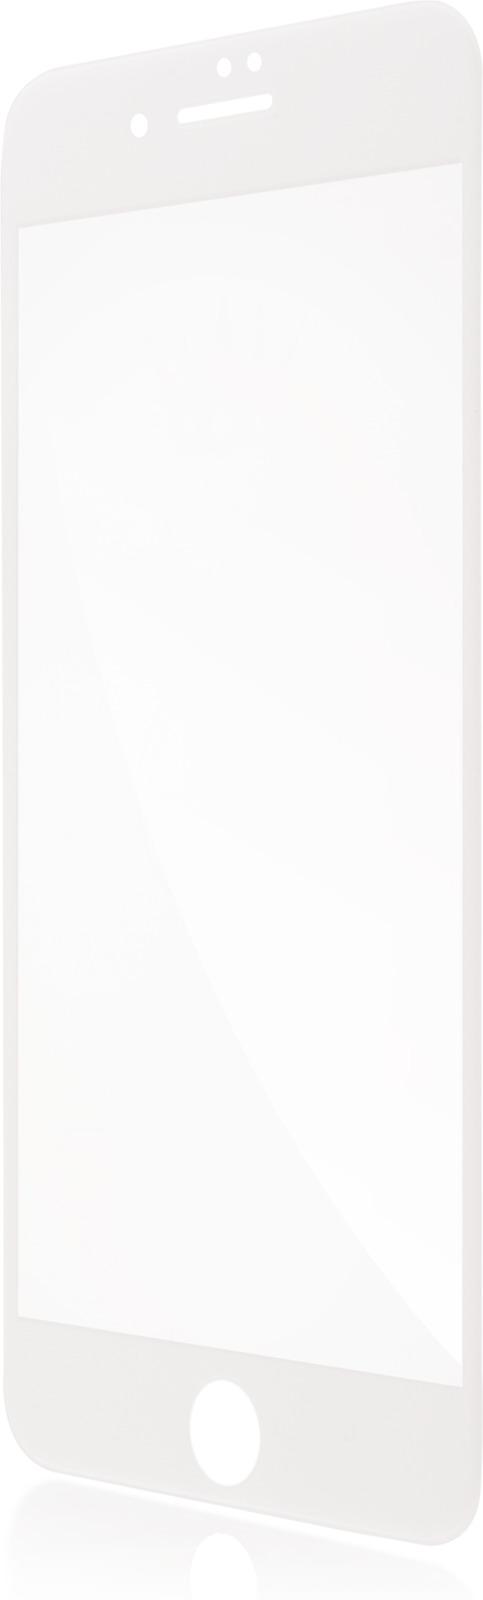 Защитное стекло Brosco 3D для Apple iPhone 7 Plus, белый